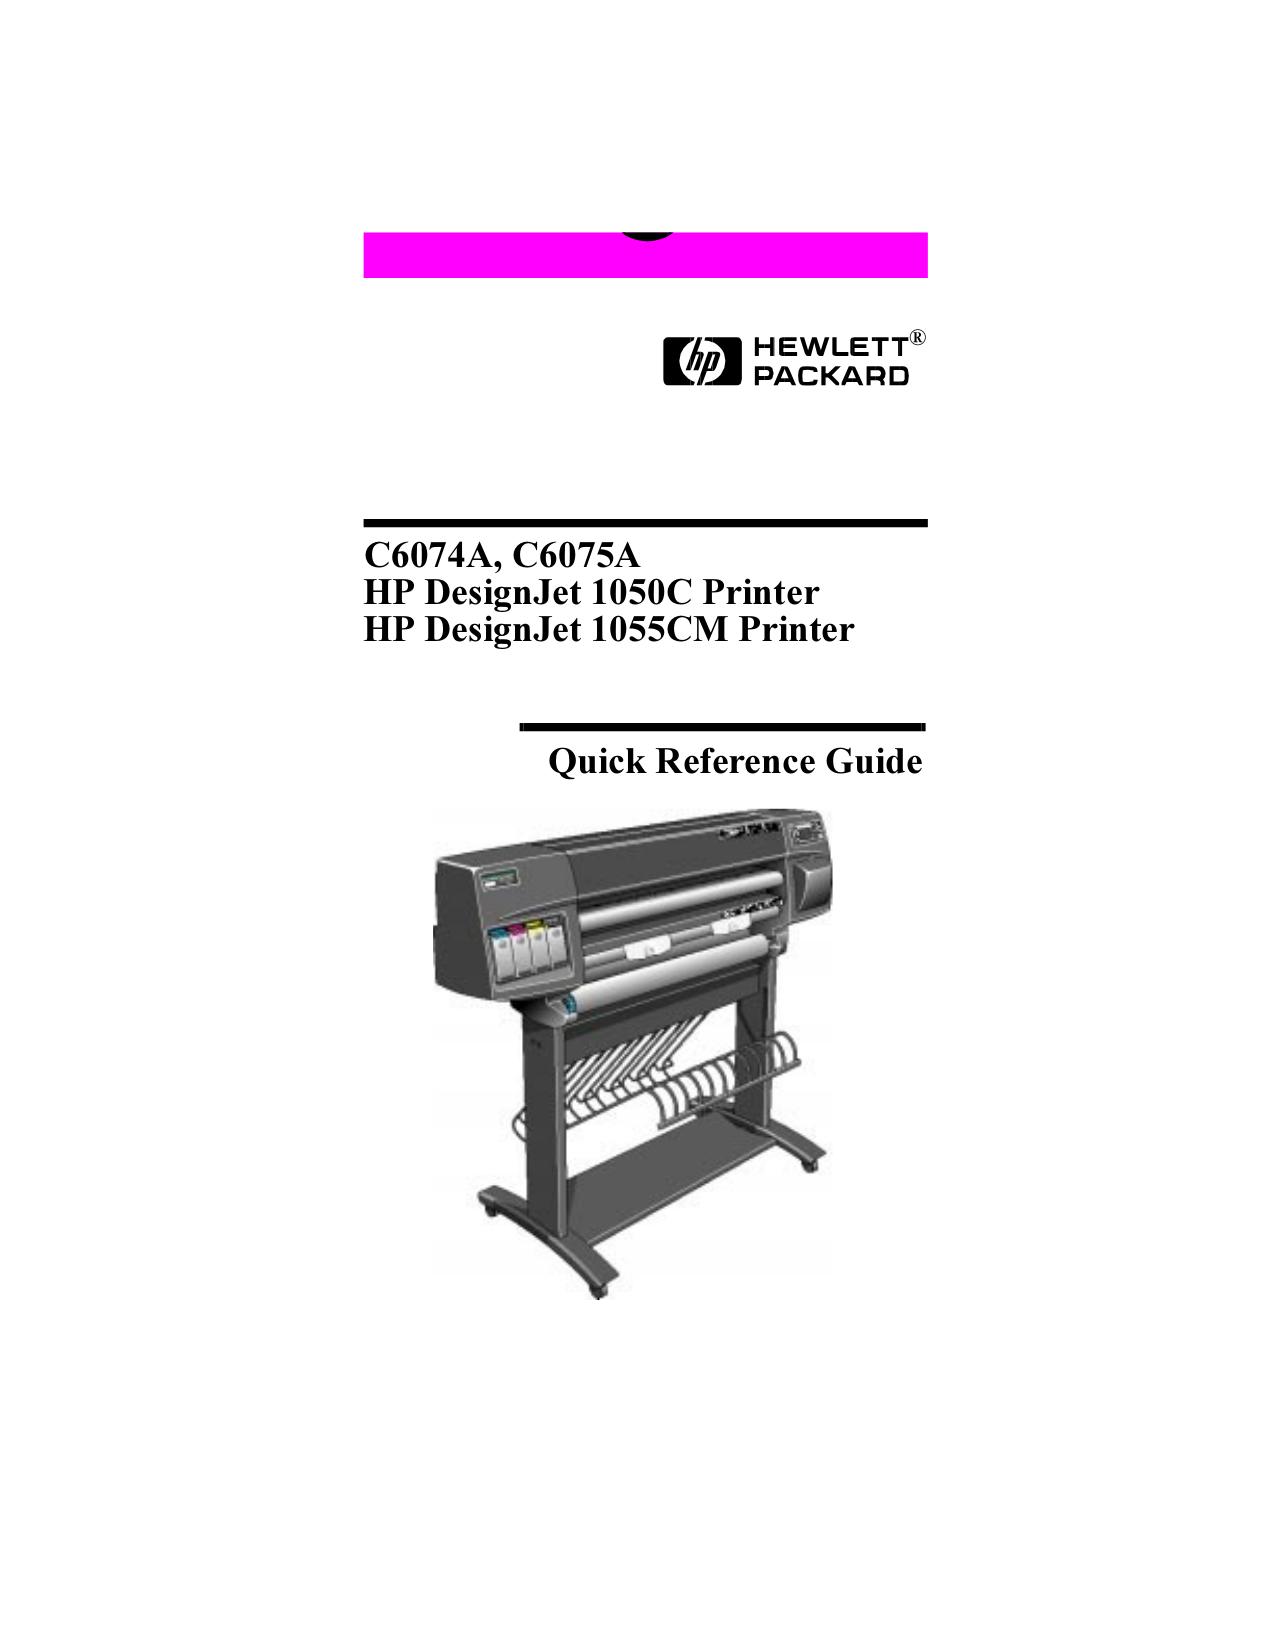 download free pdf for hp designjet 1050c printer manual rh umlib com hp designjet 1050c guide utilisateur hp designjet 1055cm user guide